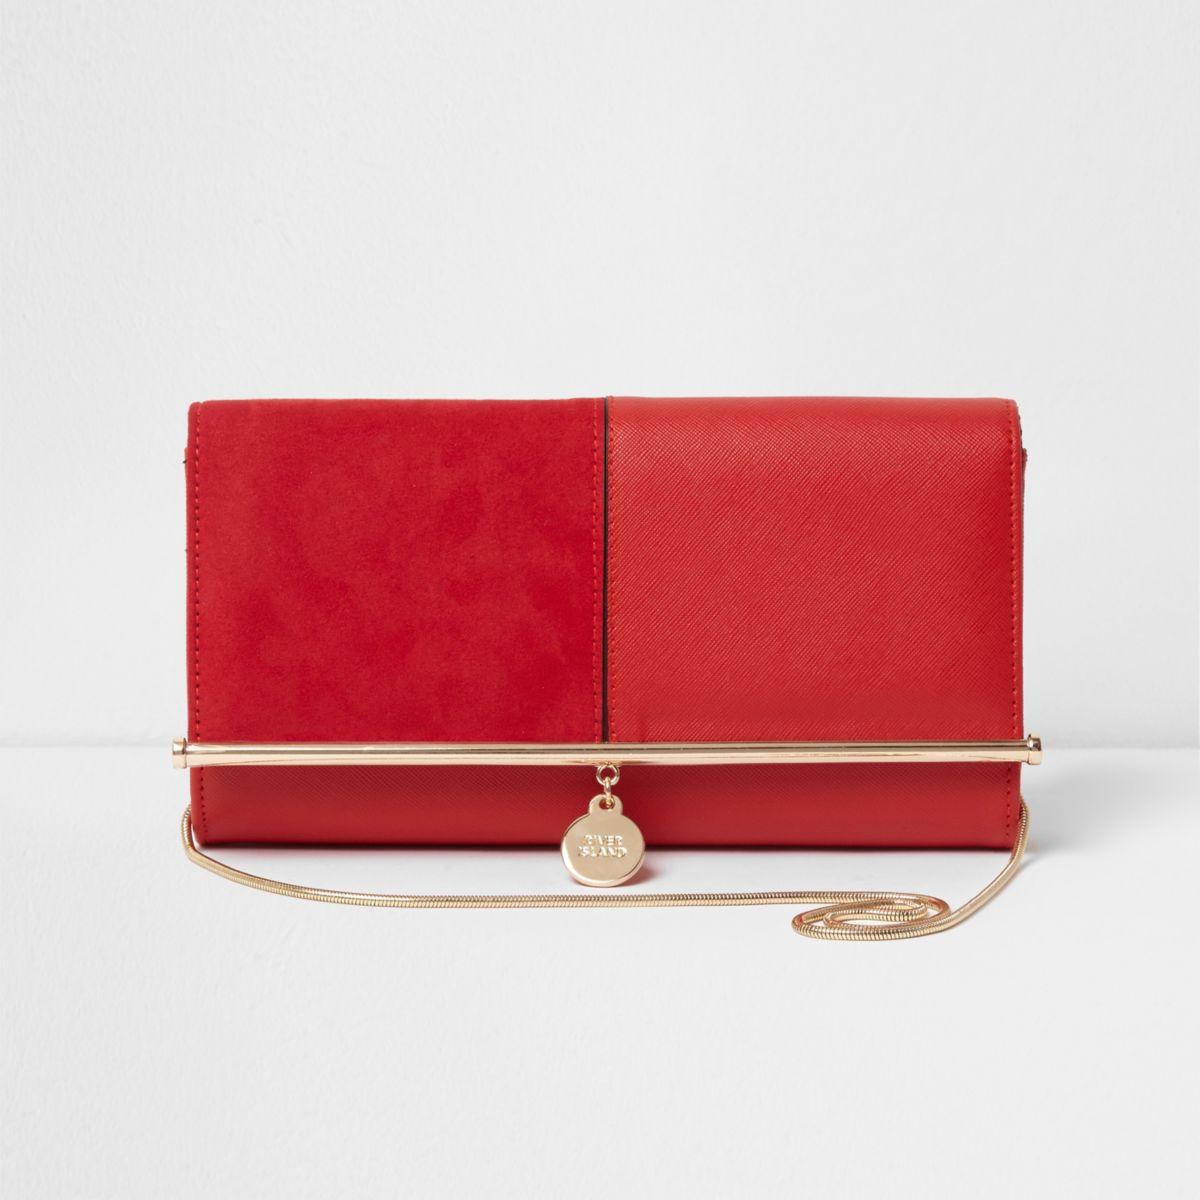 Red bar top charm clutch bag